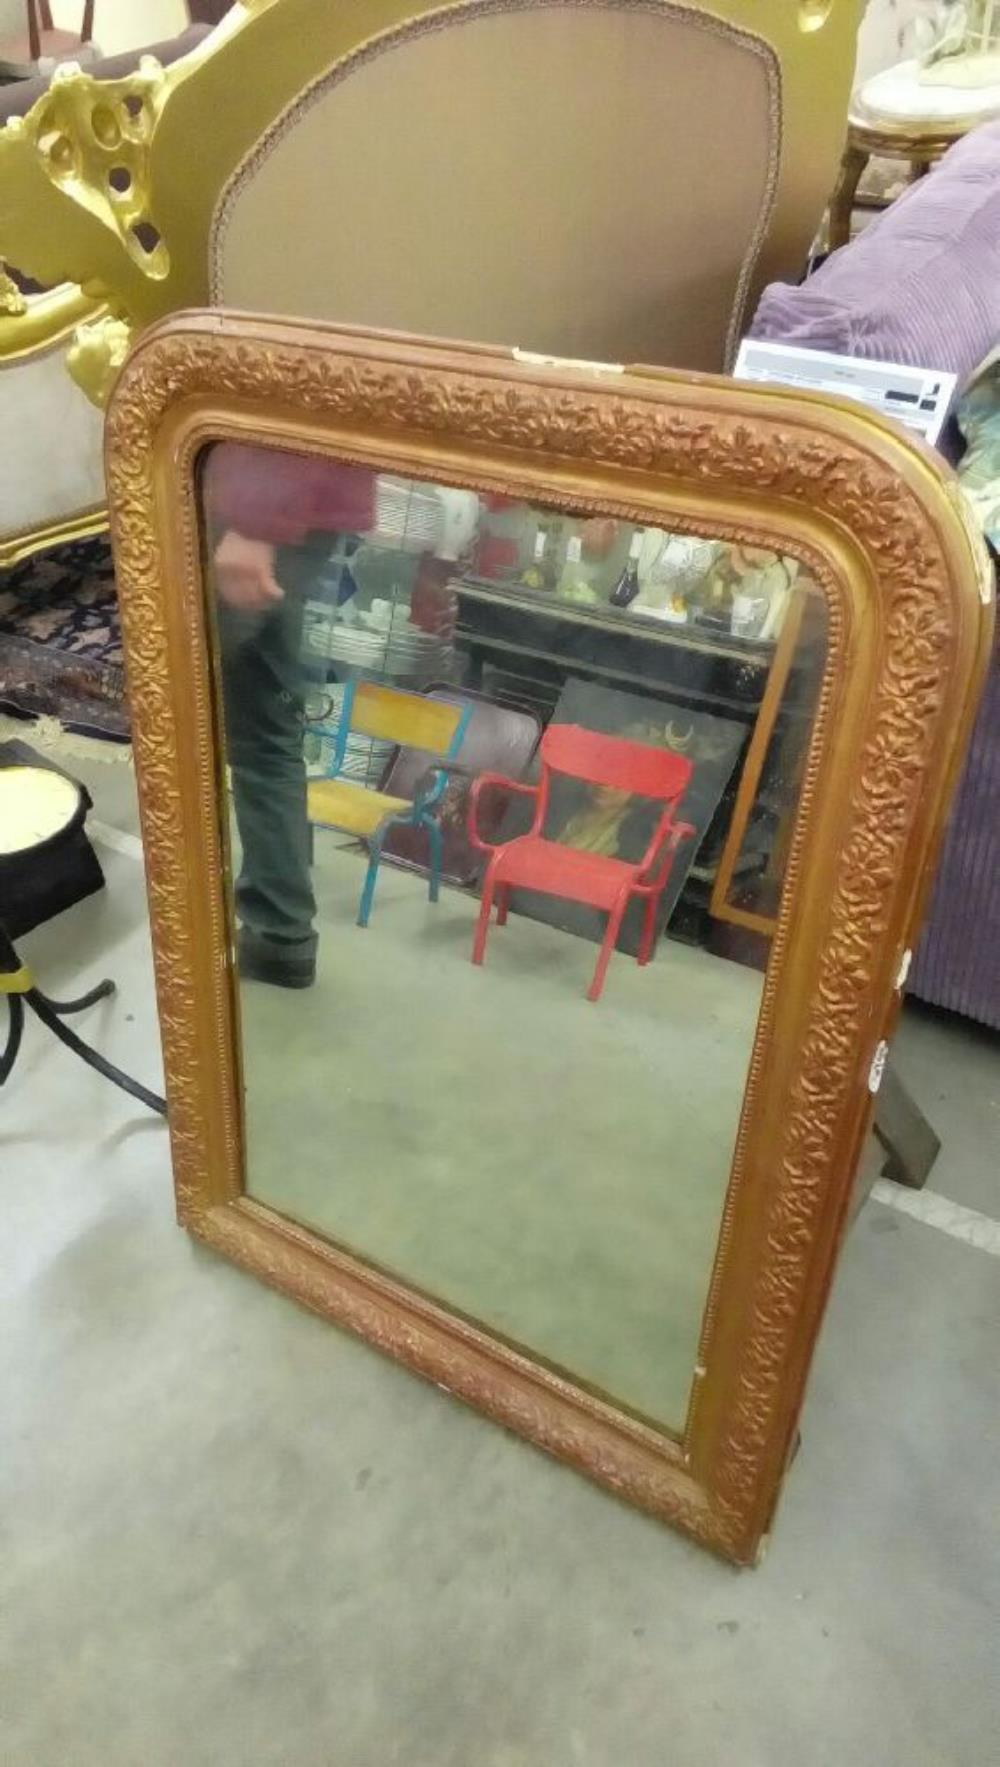 miroir ancien dore occasion troc nancy. Black Bedroom Furniture Sets. Home Design Ideas